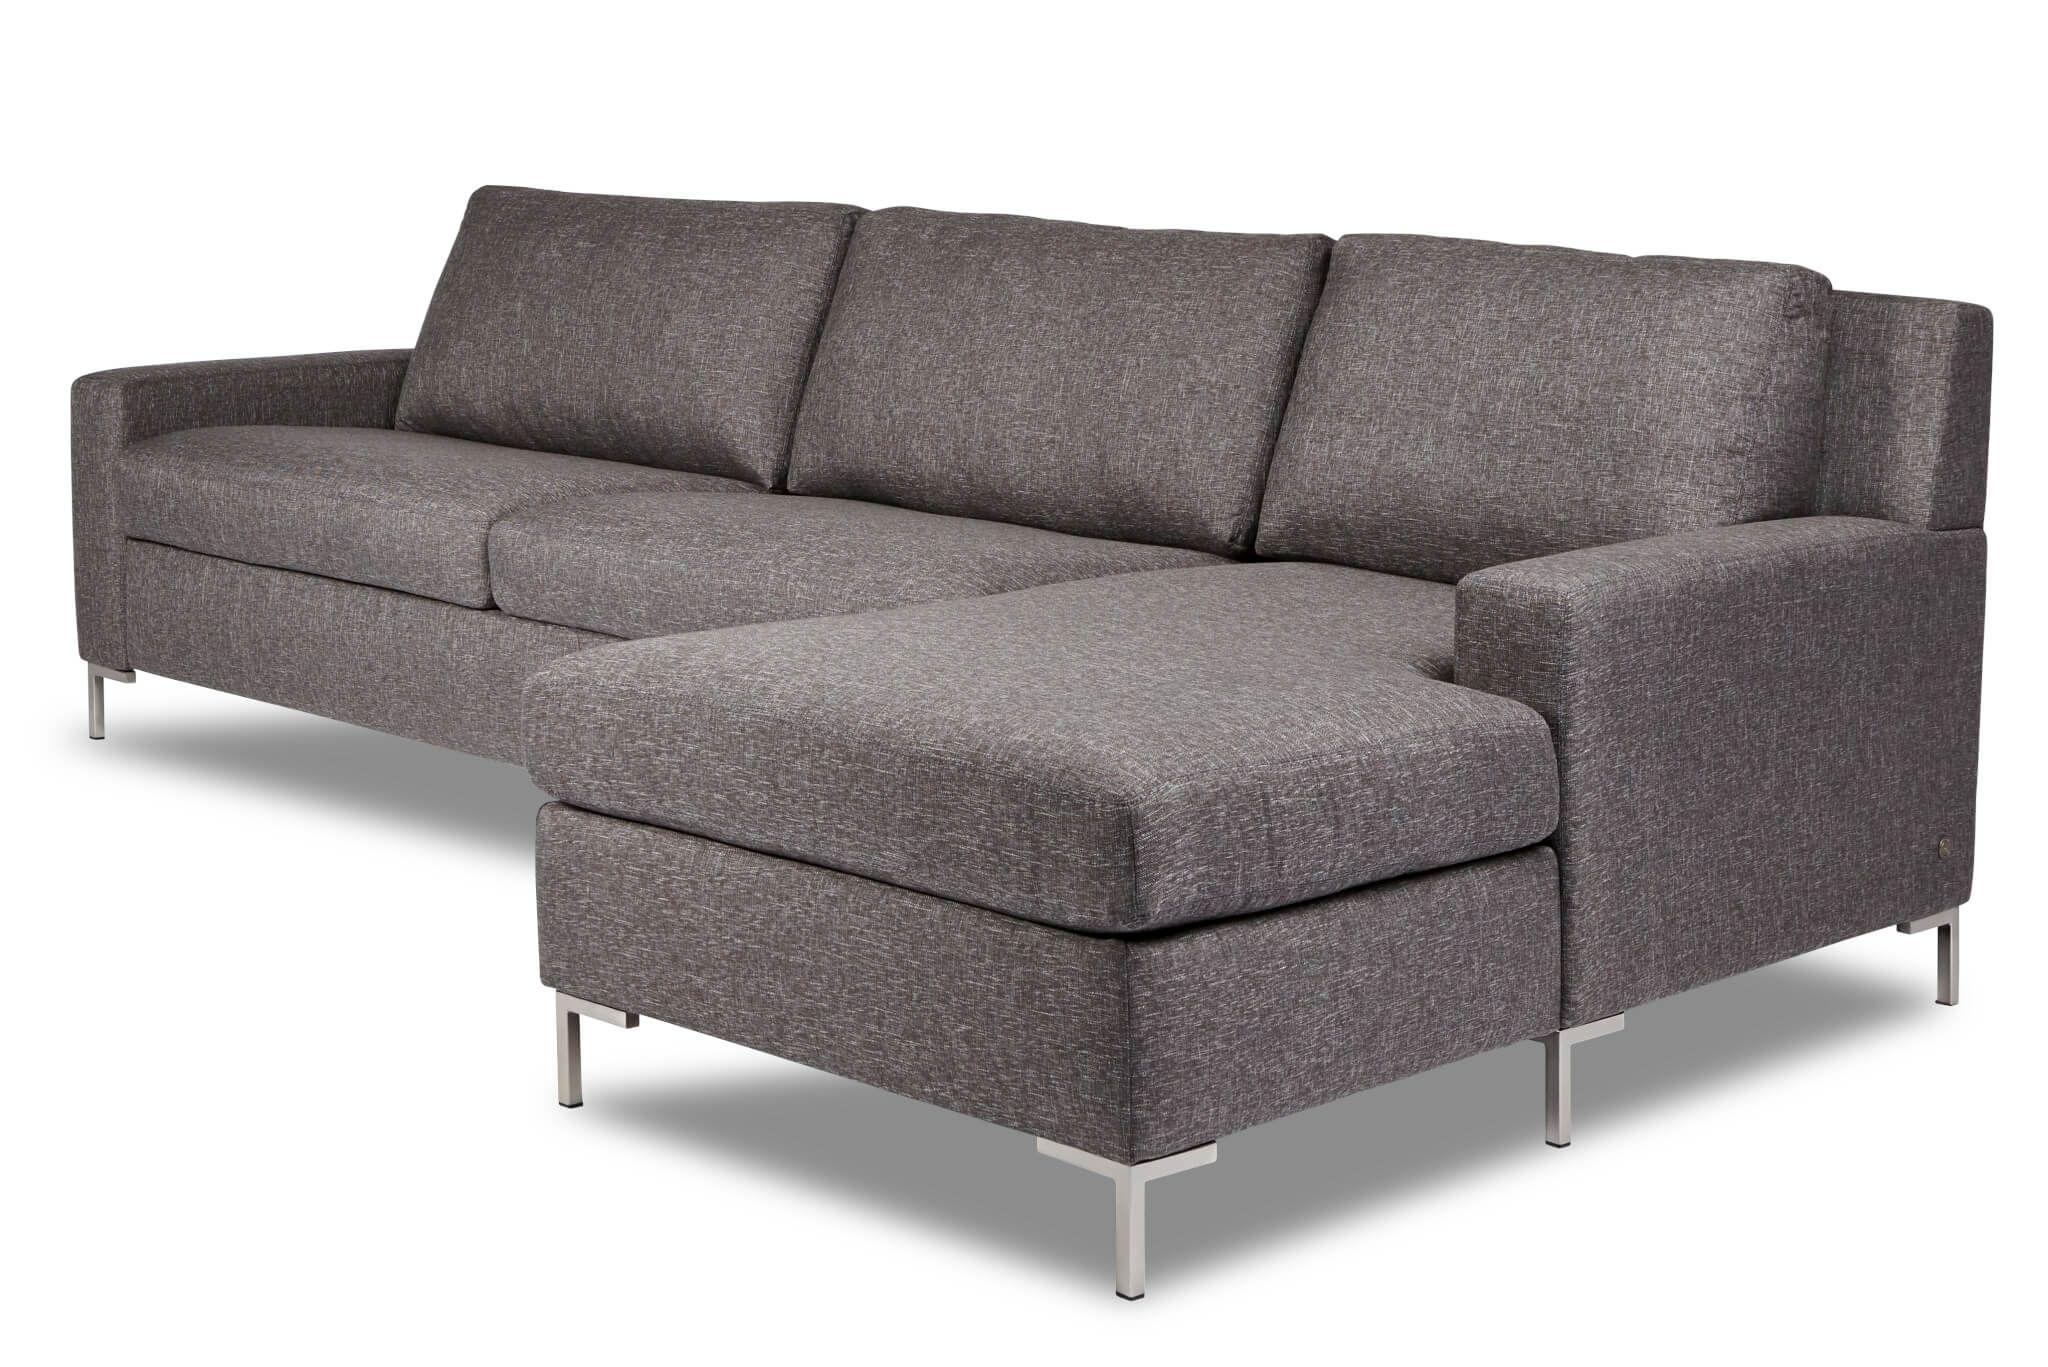 Tempurpedic Sleeper Sofa American Leather